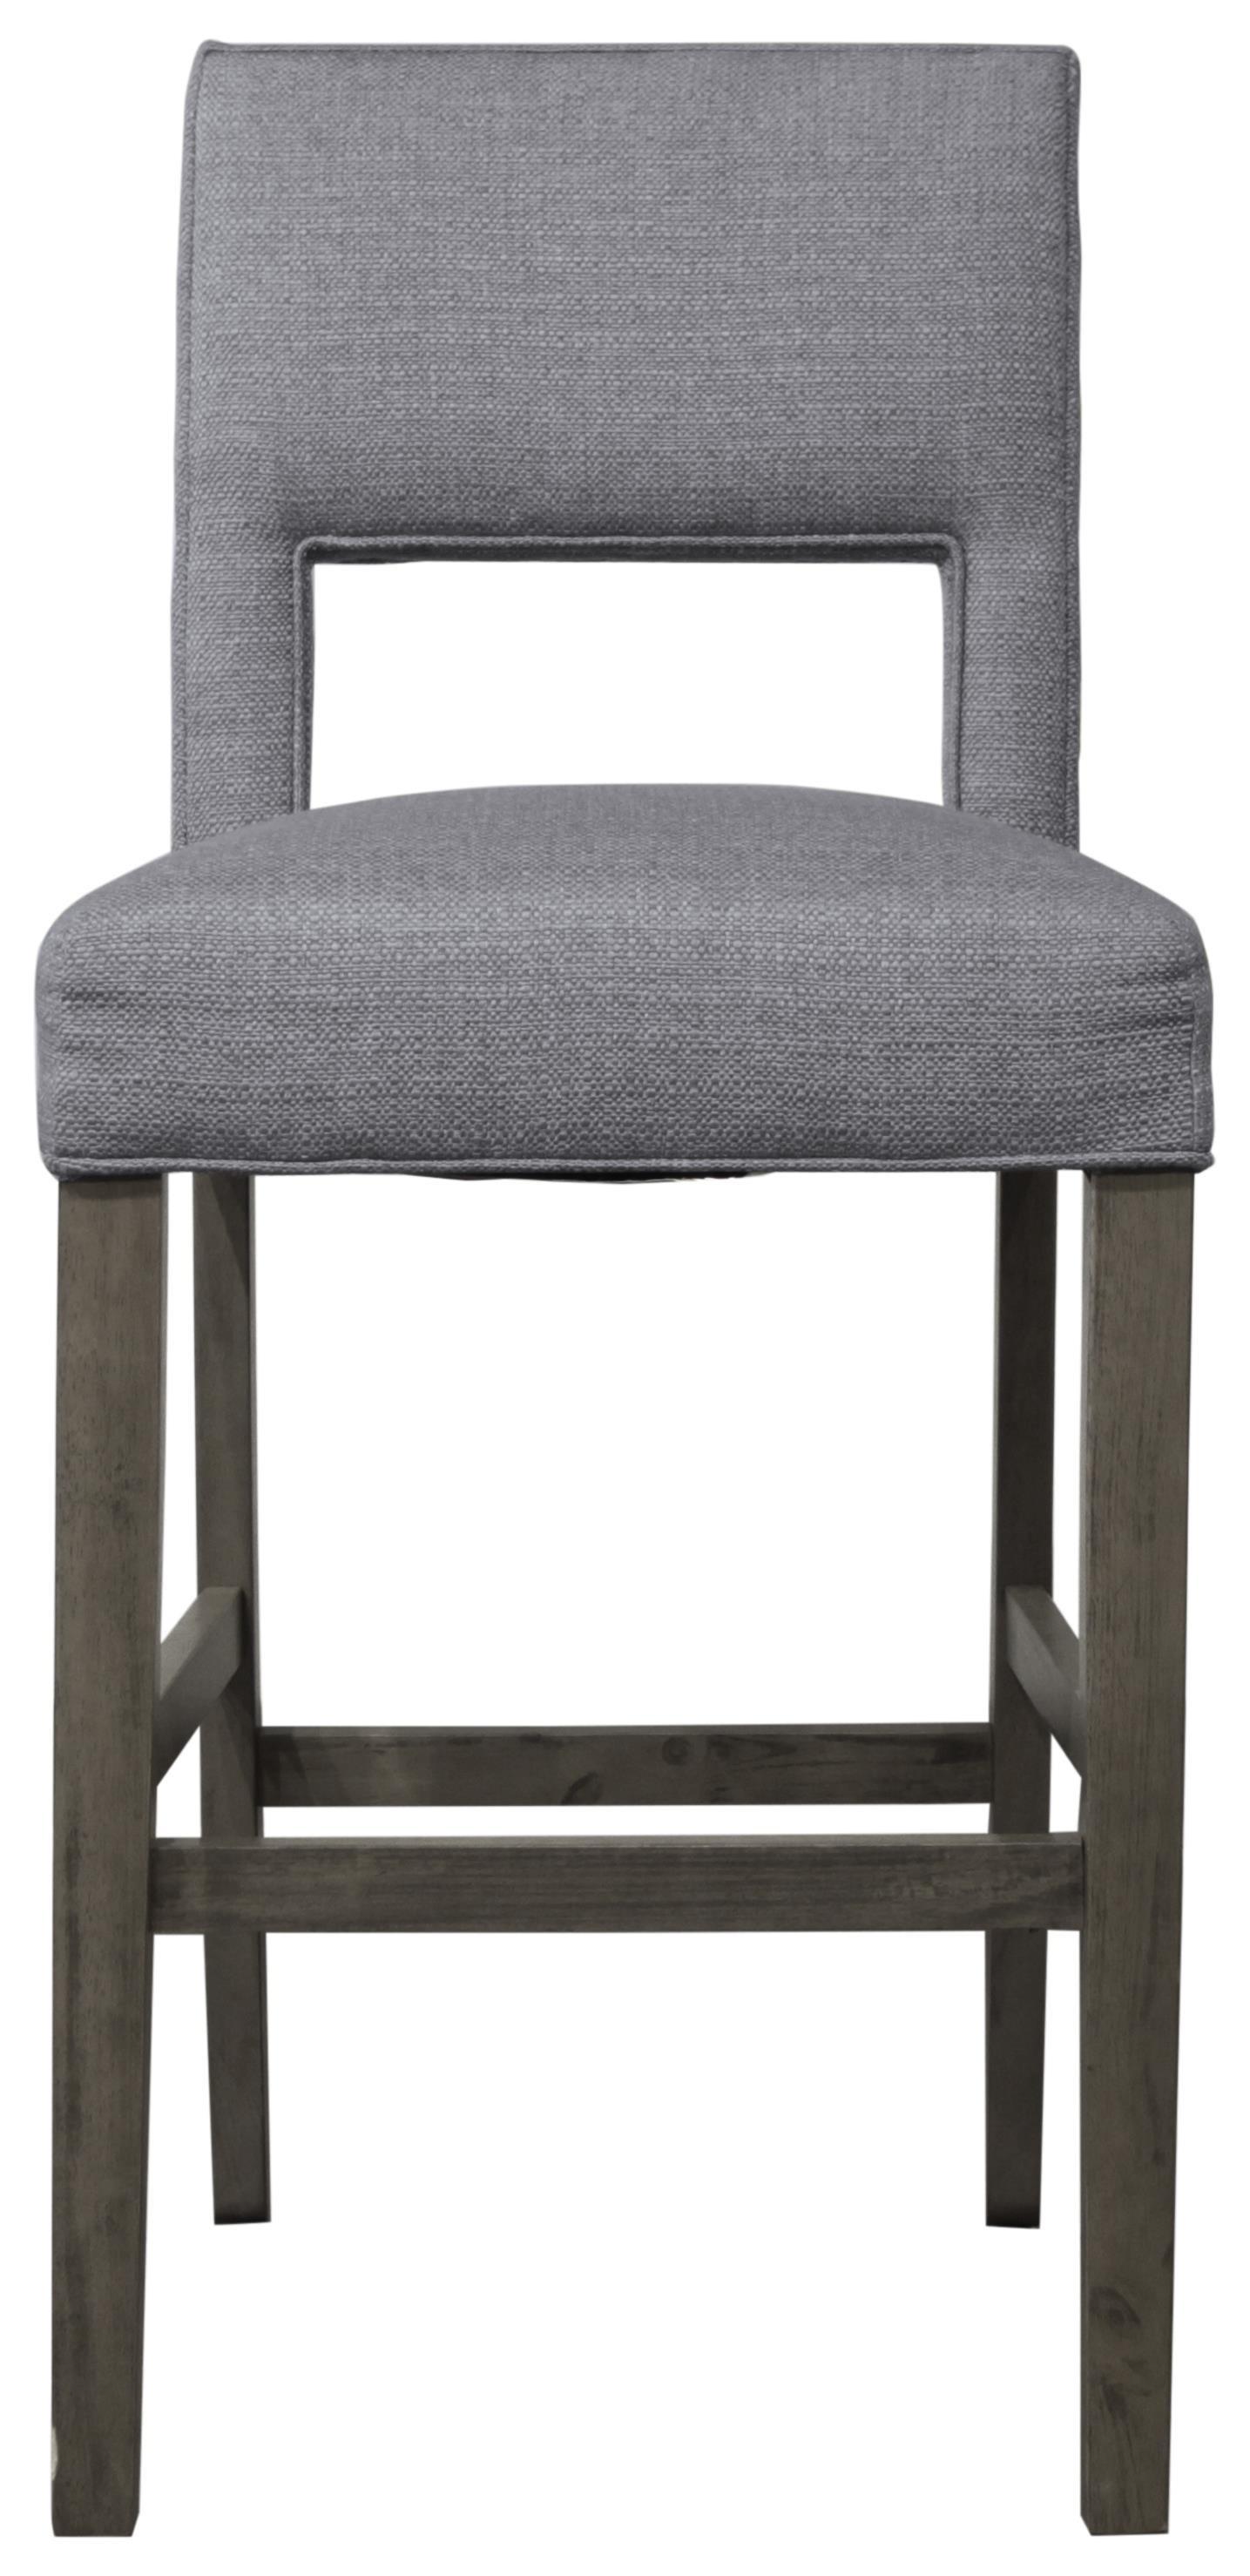 Maddox Bar Stool by Hekman at HomeWorld Furniture